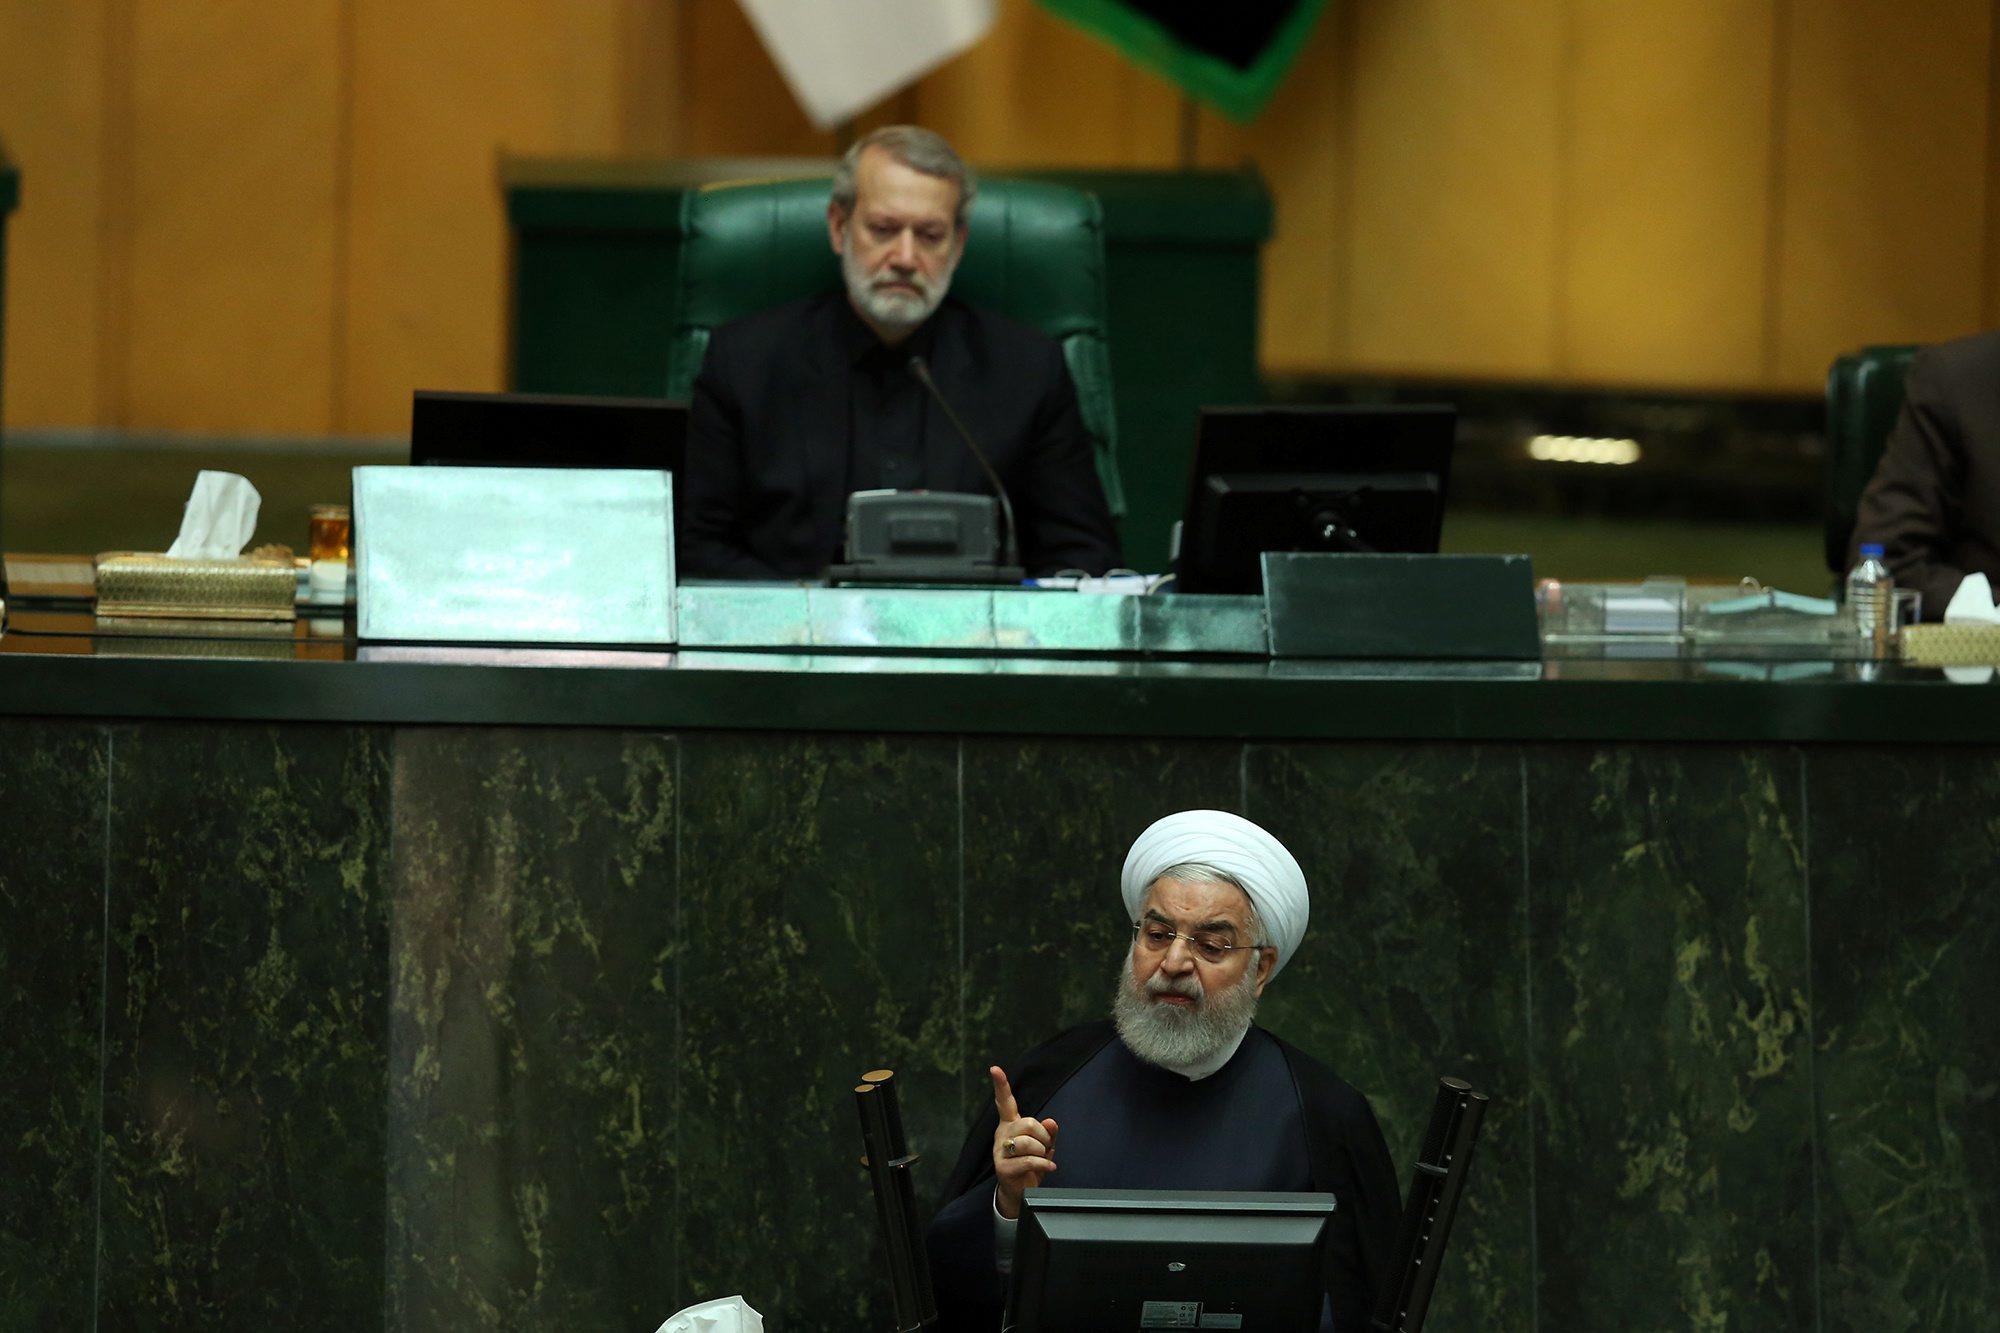 Iranski predsjednik Hassan Rouhani u parlamentu